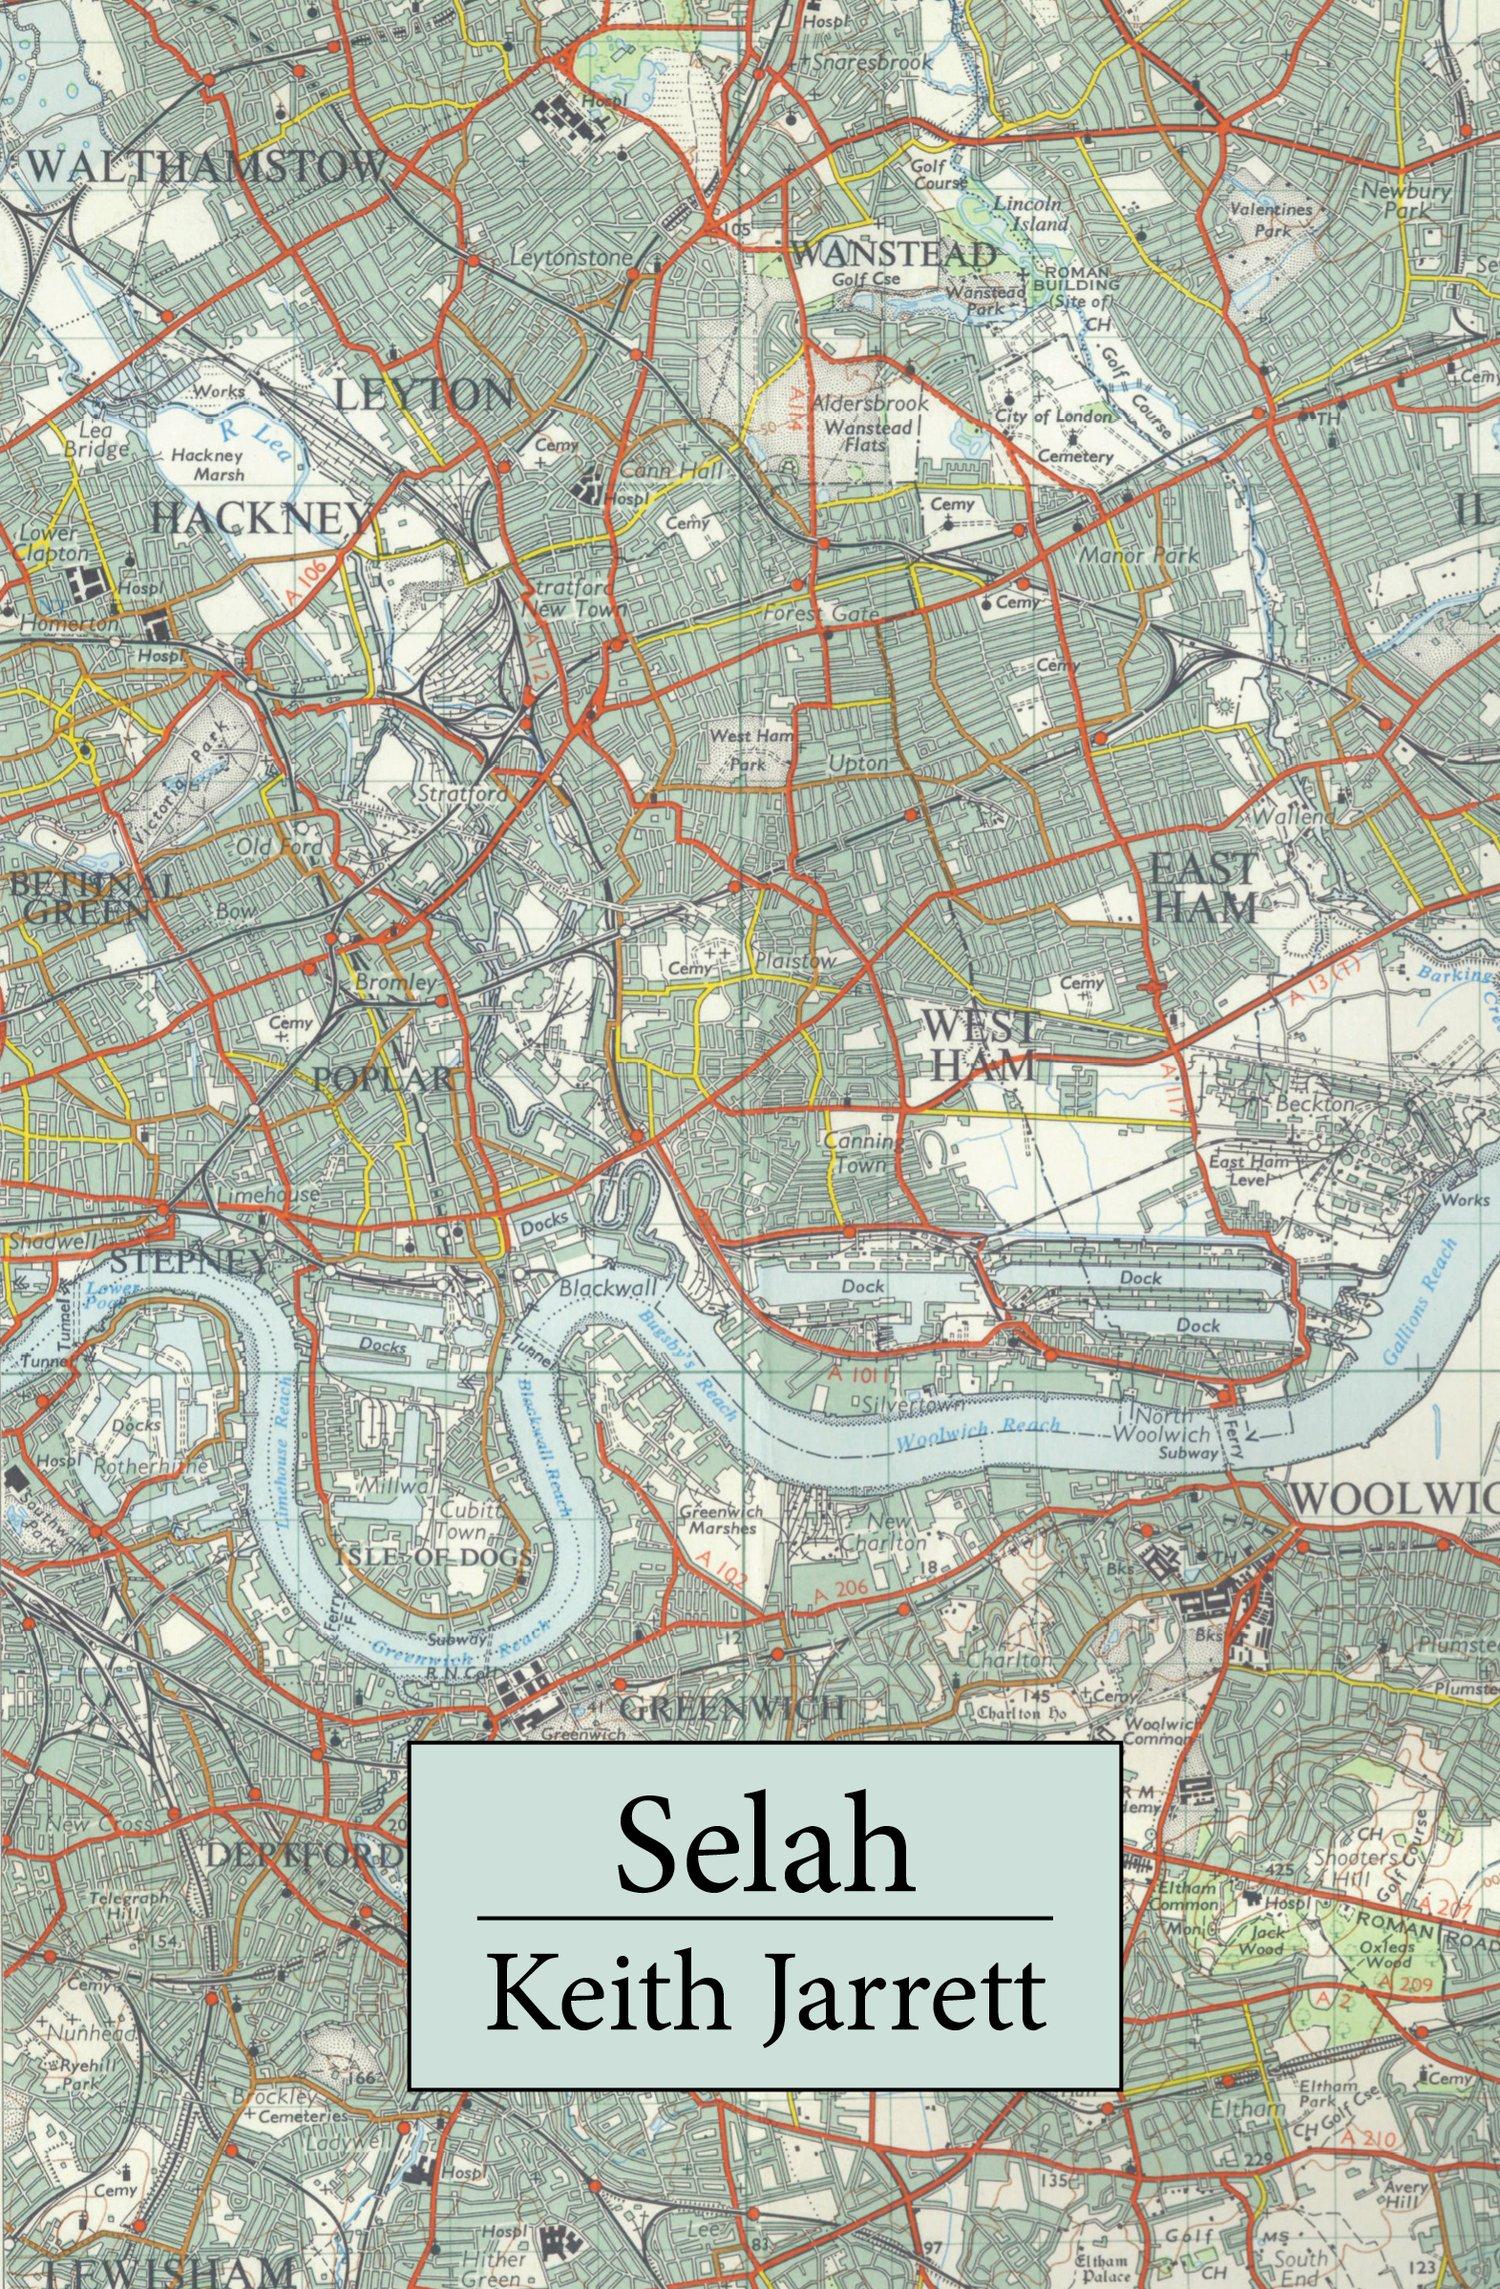 Image of Selah by Keith Jarrett